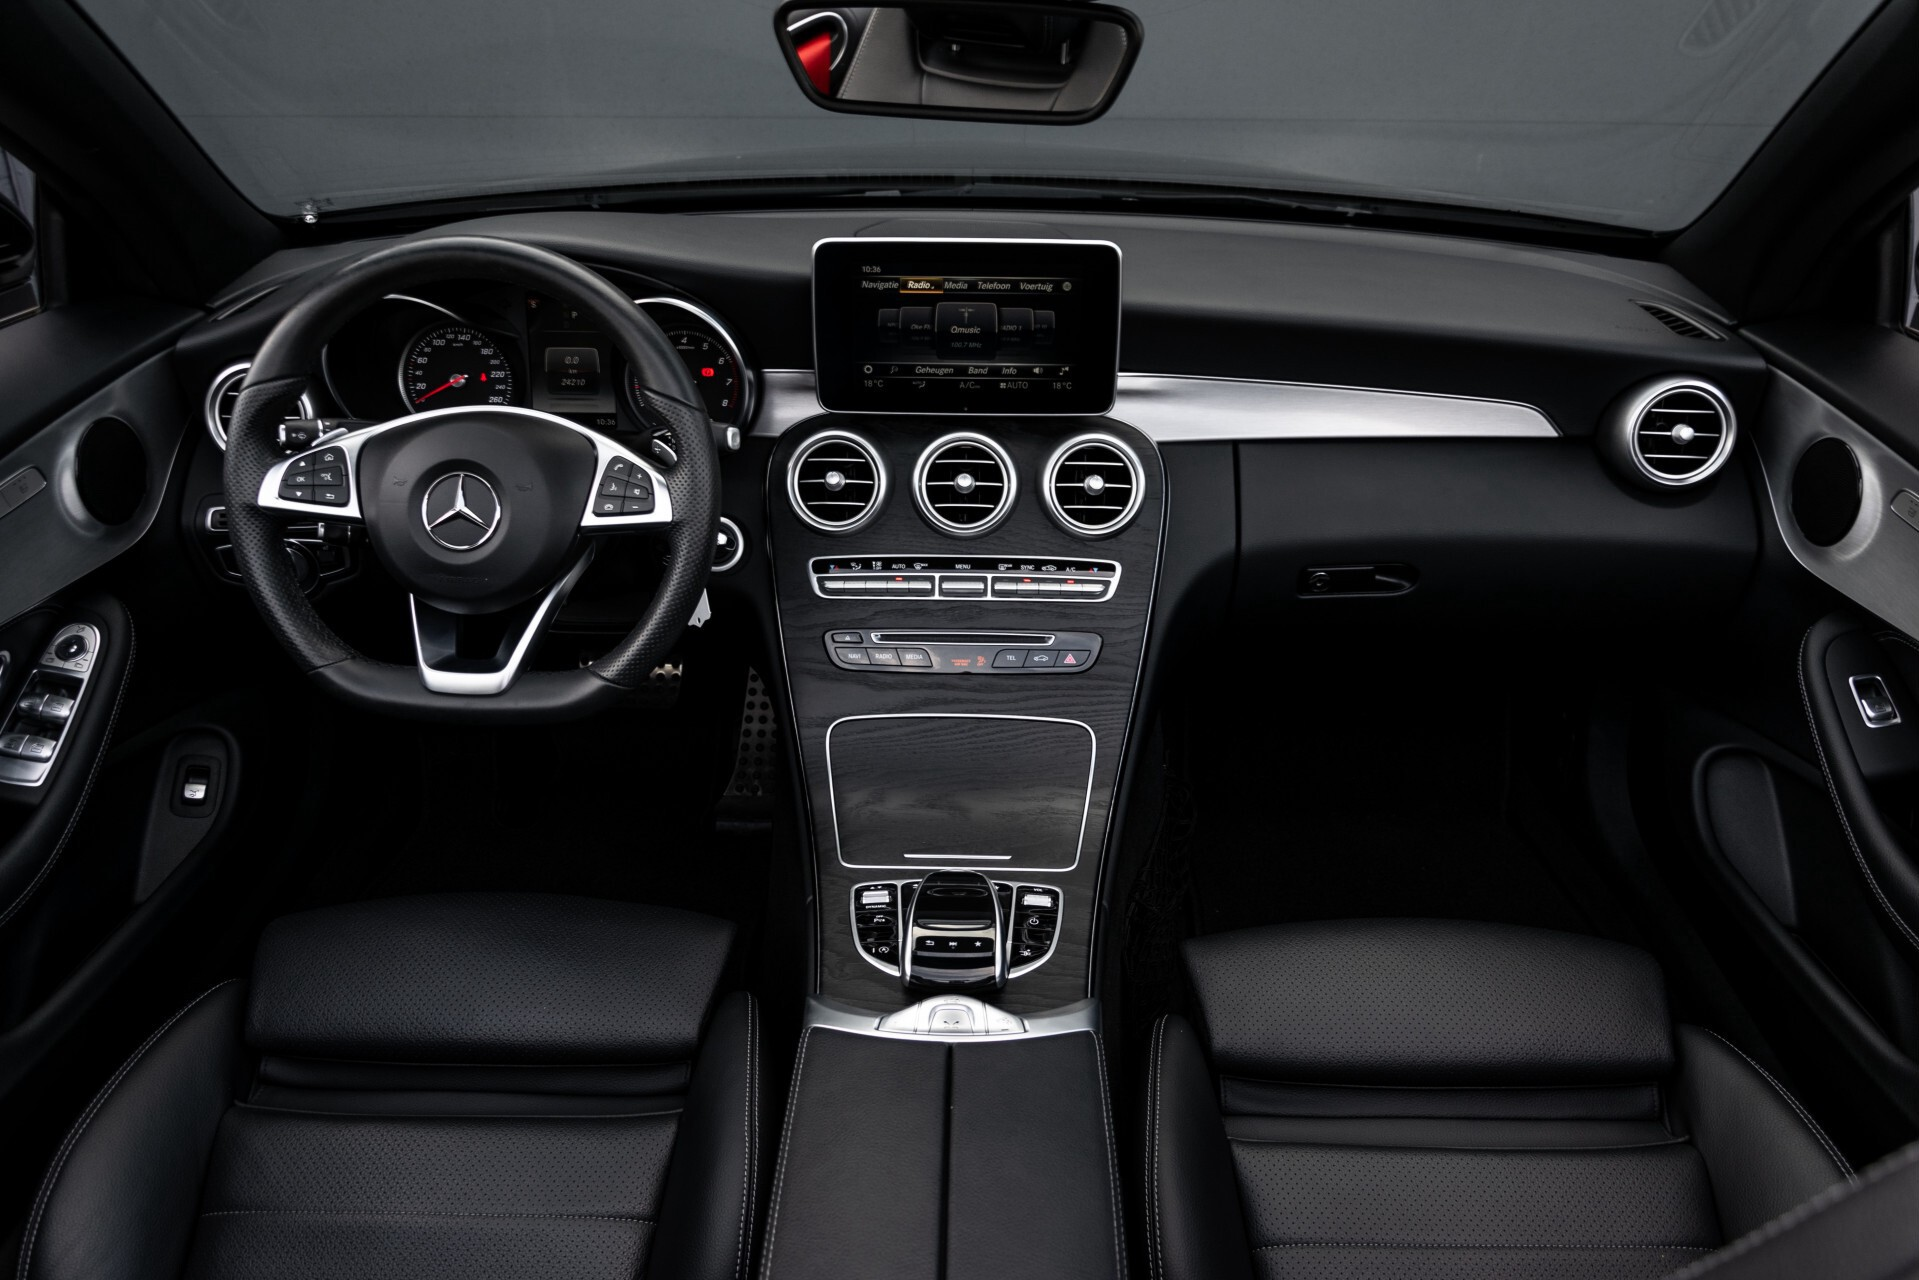 Mercedes-Benz C-Klasse Cabrio 250 AMG Airscarf/Aircap/Comand/ILS/Camera/Rode cabriokap Aut9 Foto 9